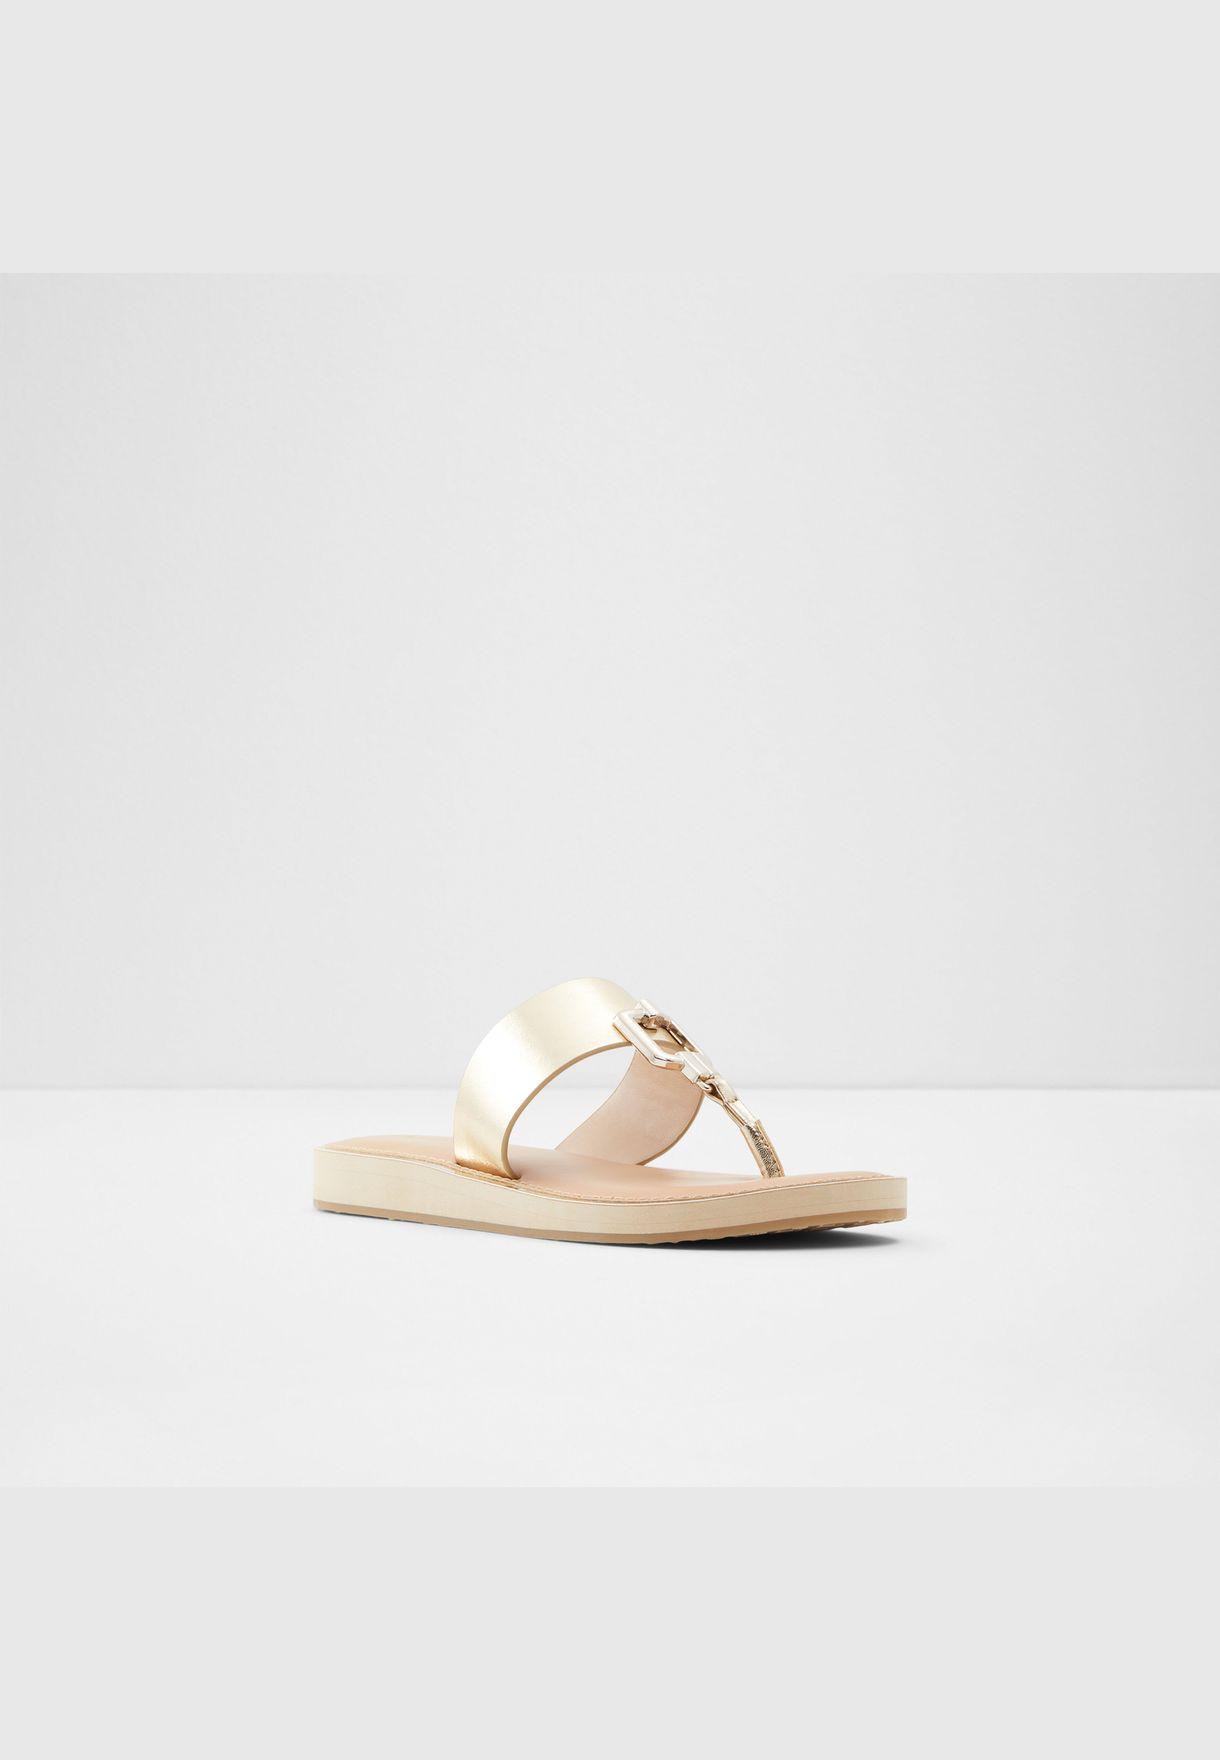 ALDO TATYX Women Synthetic Leather Sandal Flat Heel Euro 42.5 Gold